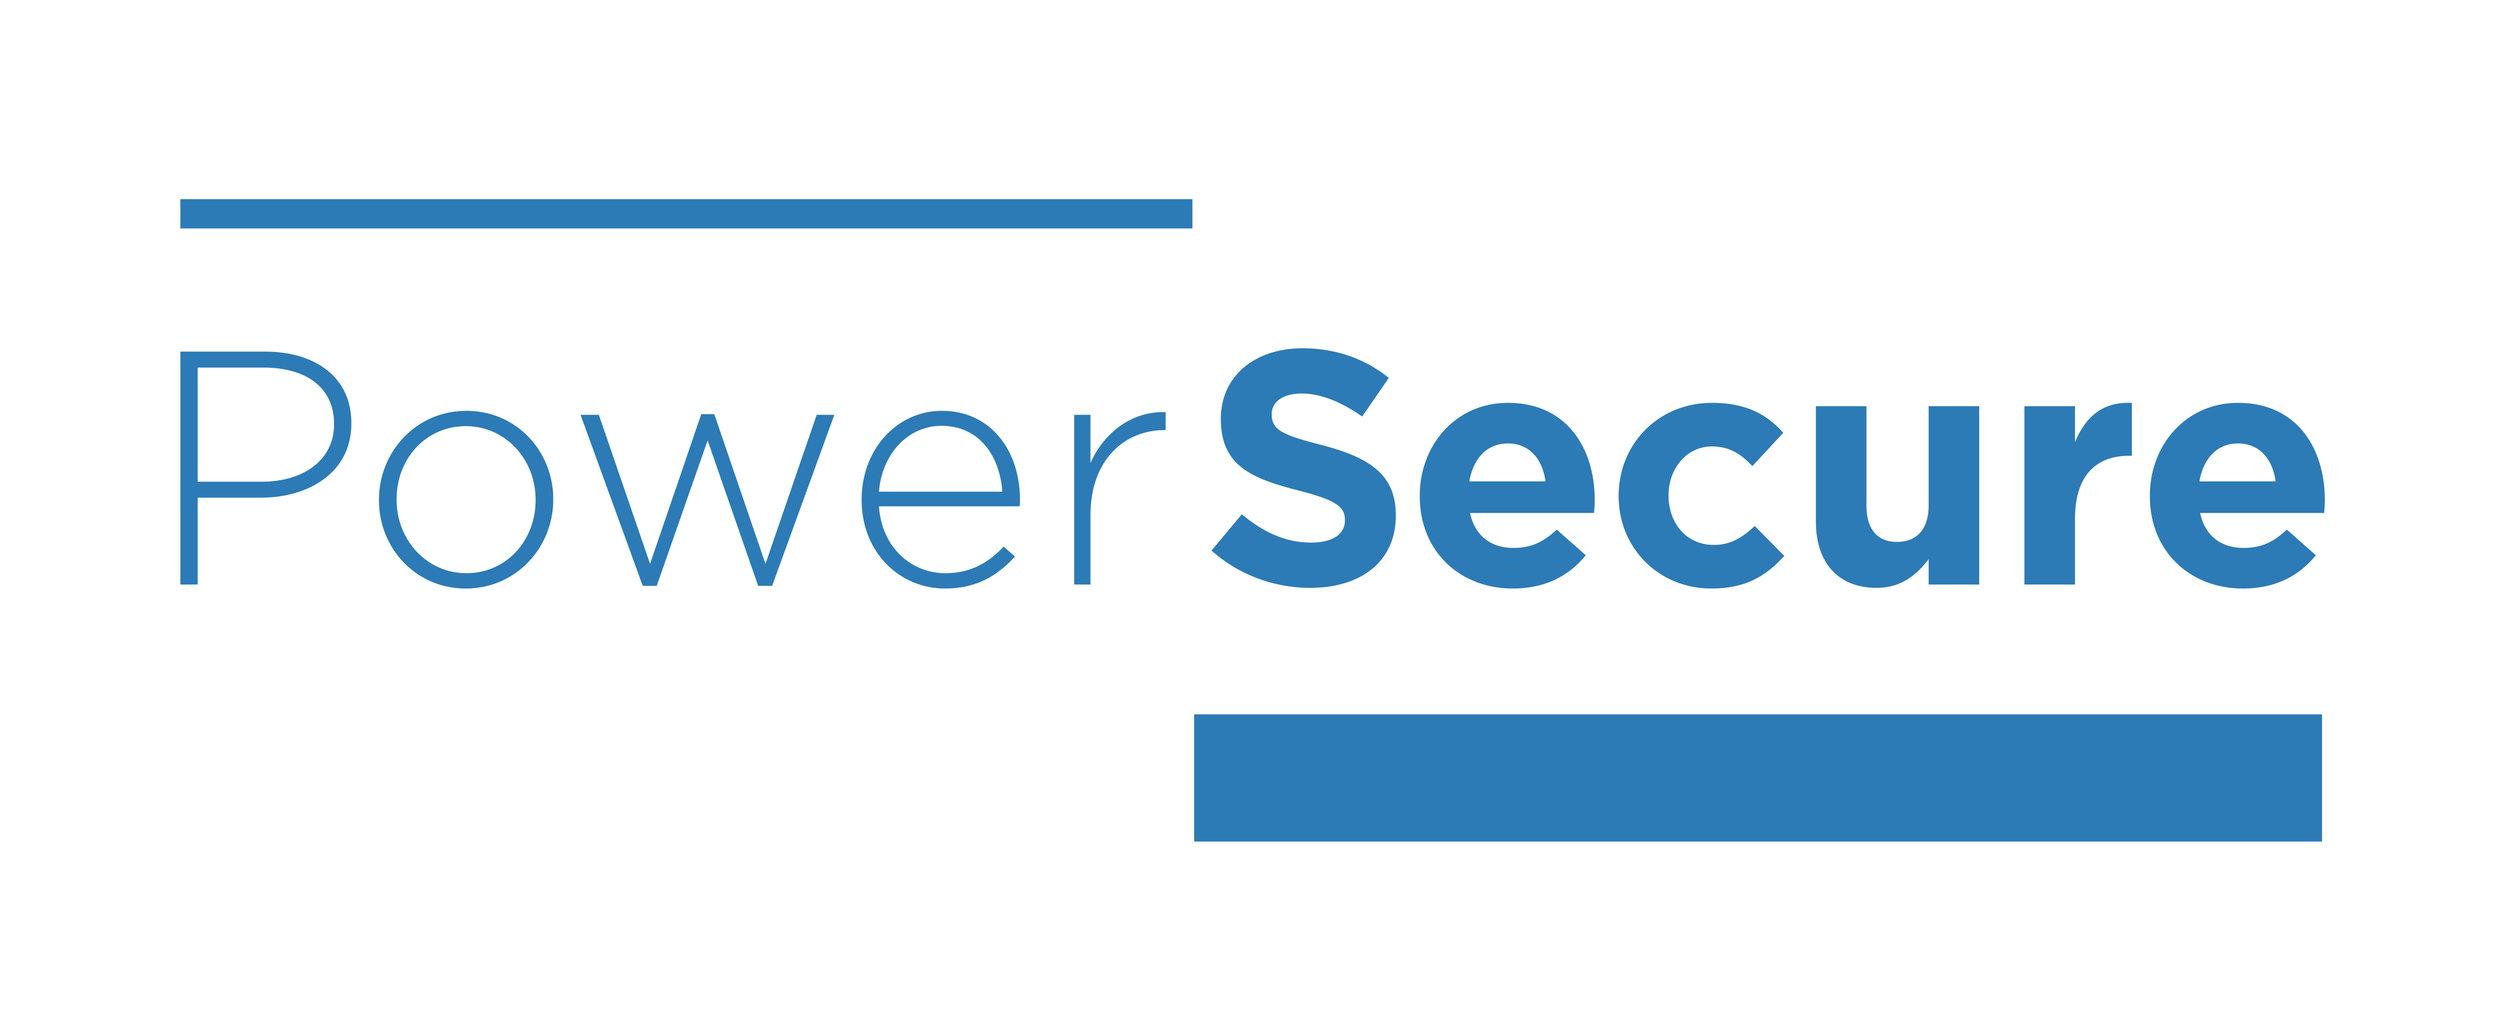 PowerSecure.jpg